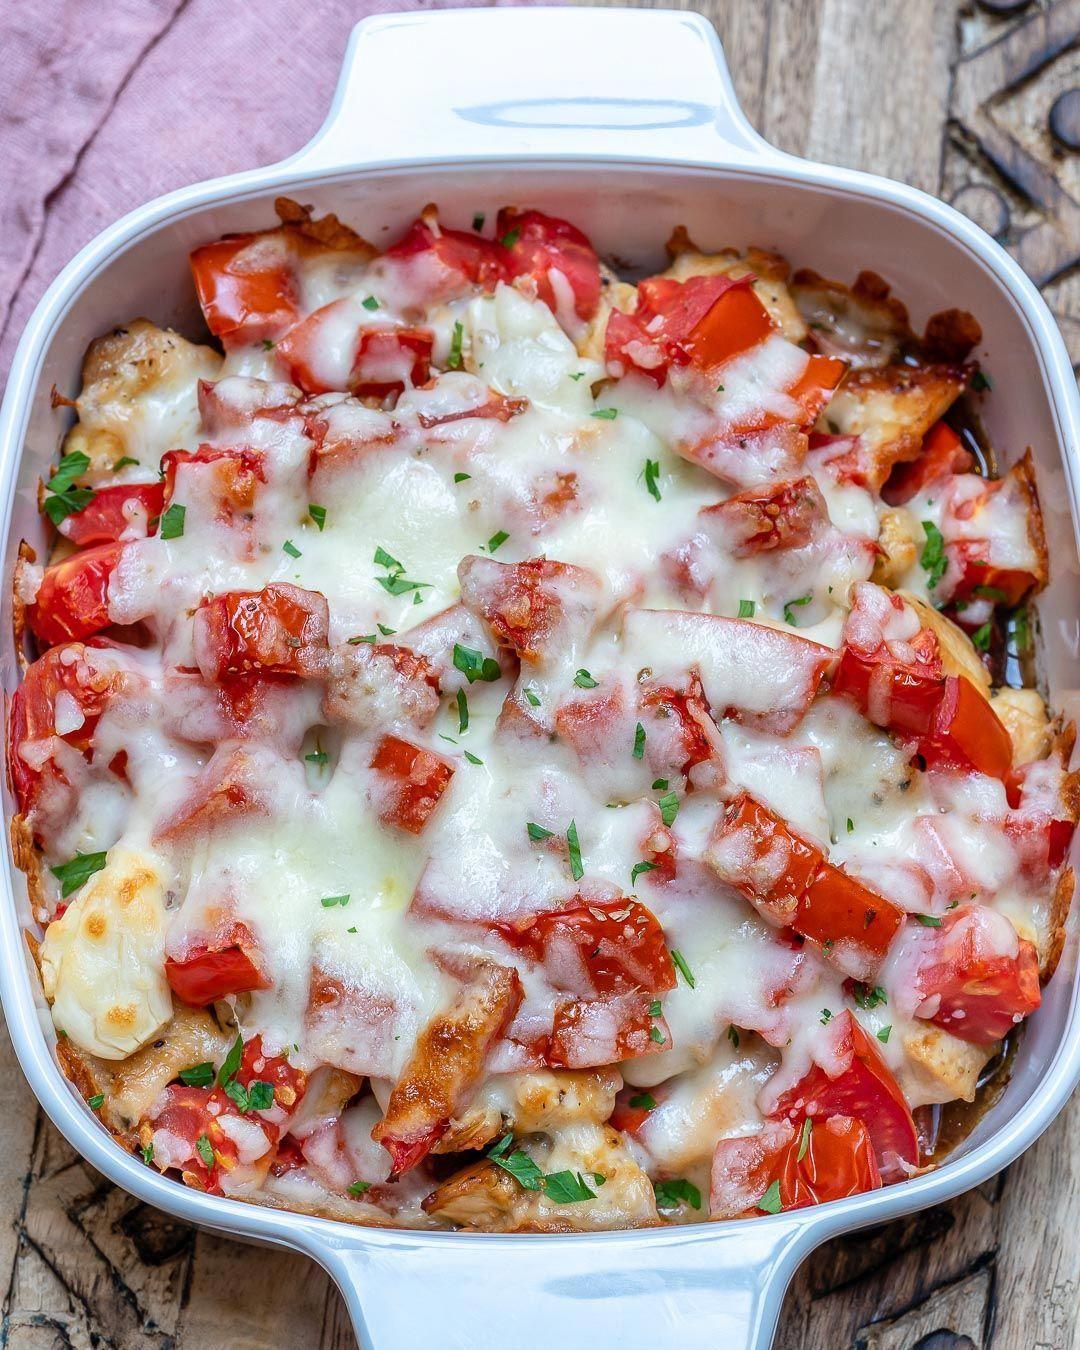 Bruschetta Chicken Casserole for a Delicious Clean Eating Dinner Idea! #deliciousdinnerrecipes